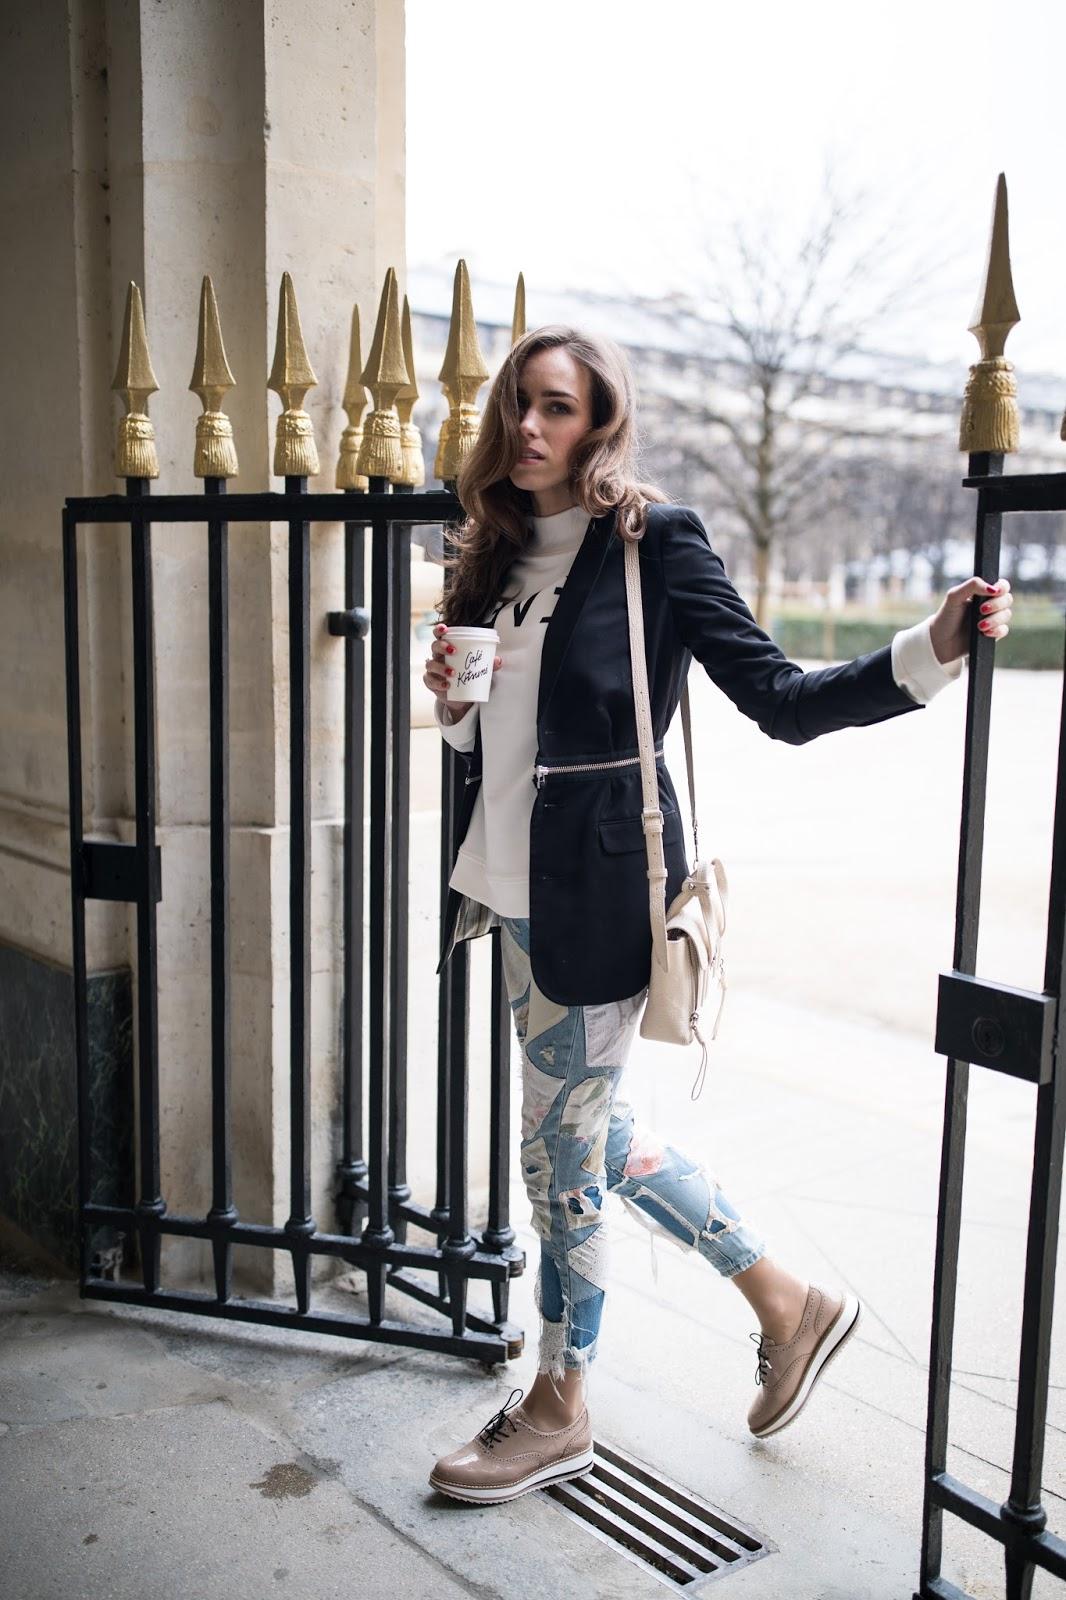 kristjaana mere paris street style spring blazer outfit